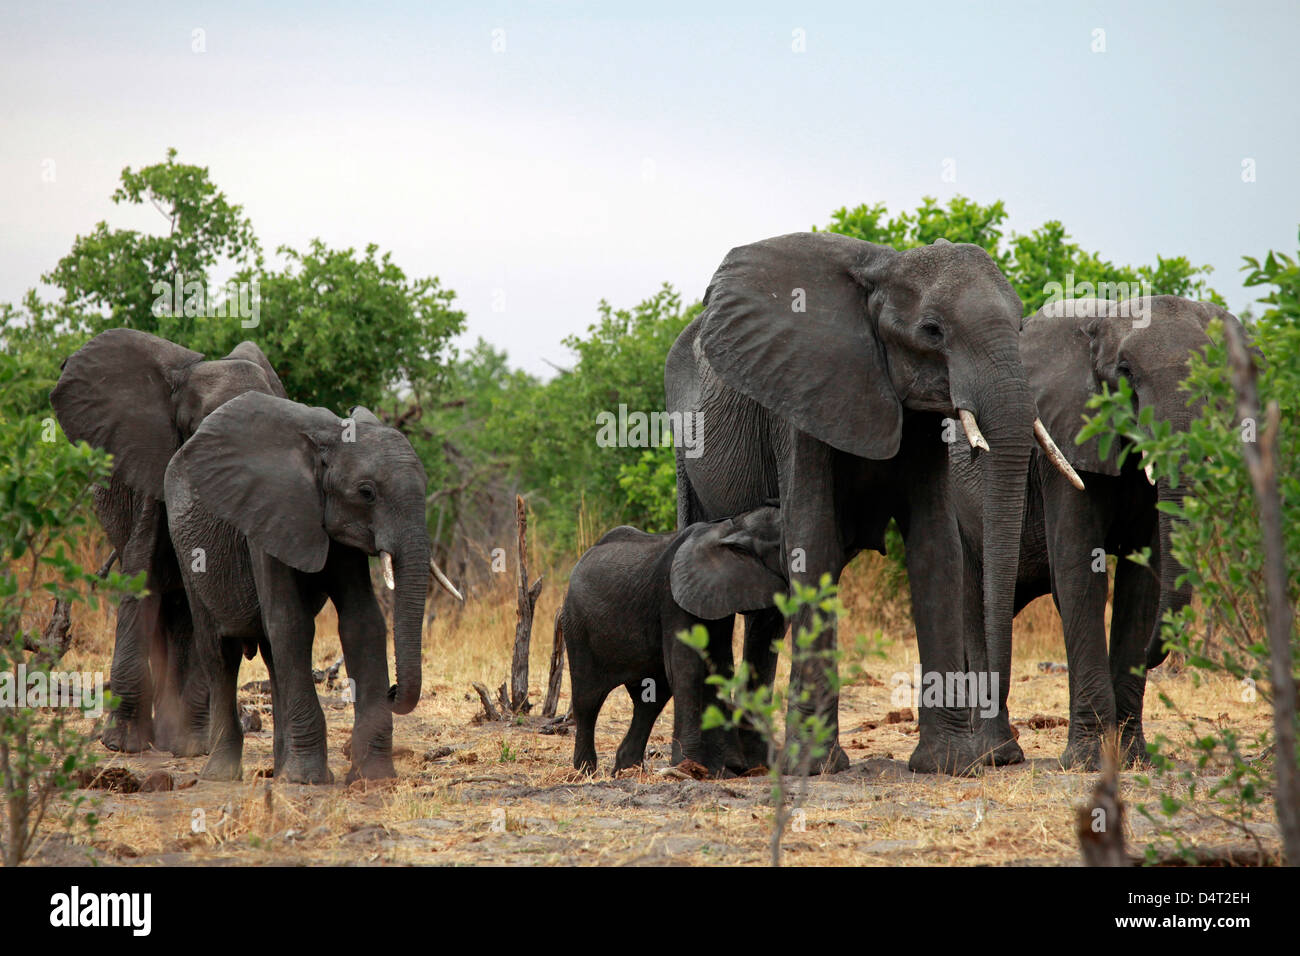 Botswana, Savute. Elephant family of Savute in Chobe National Park. - Stock Image